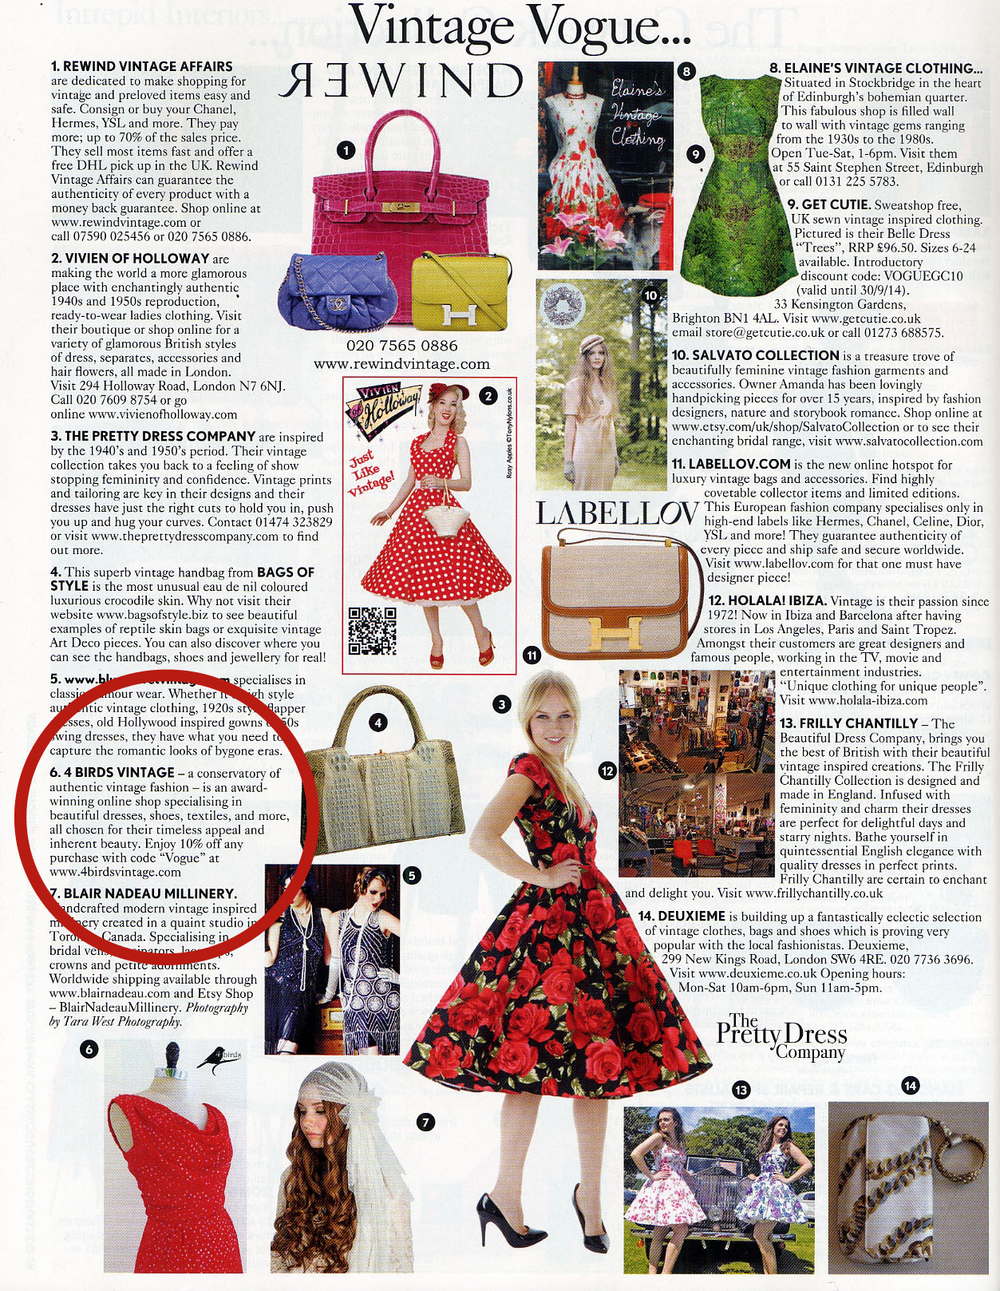 Vinatge Vogue sep 14.jpg